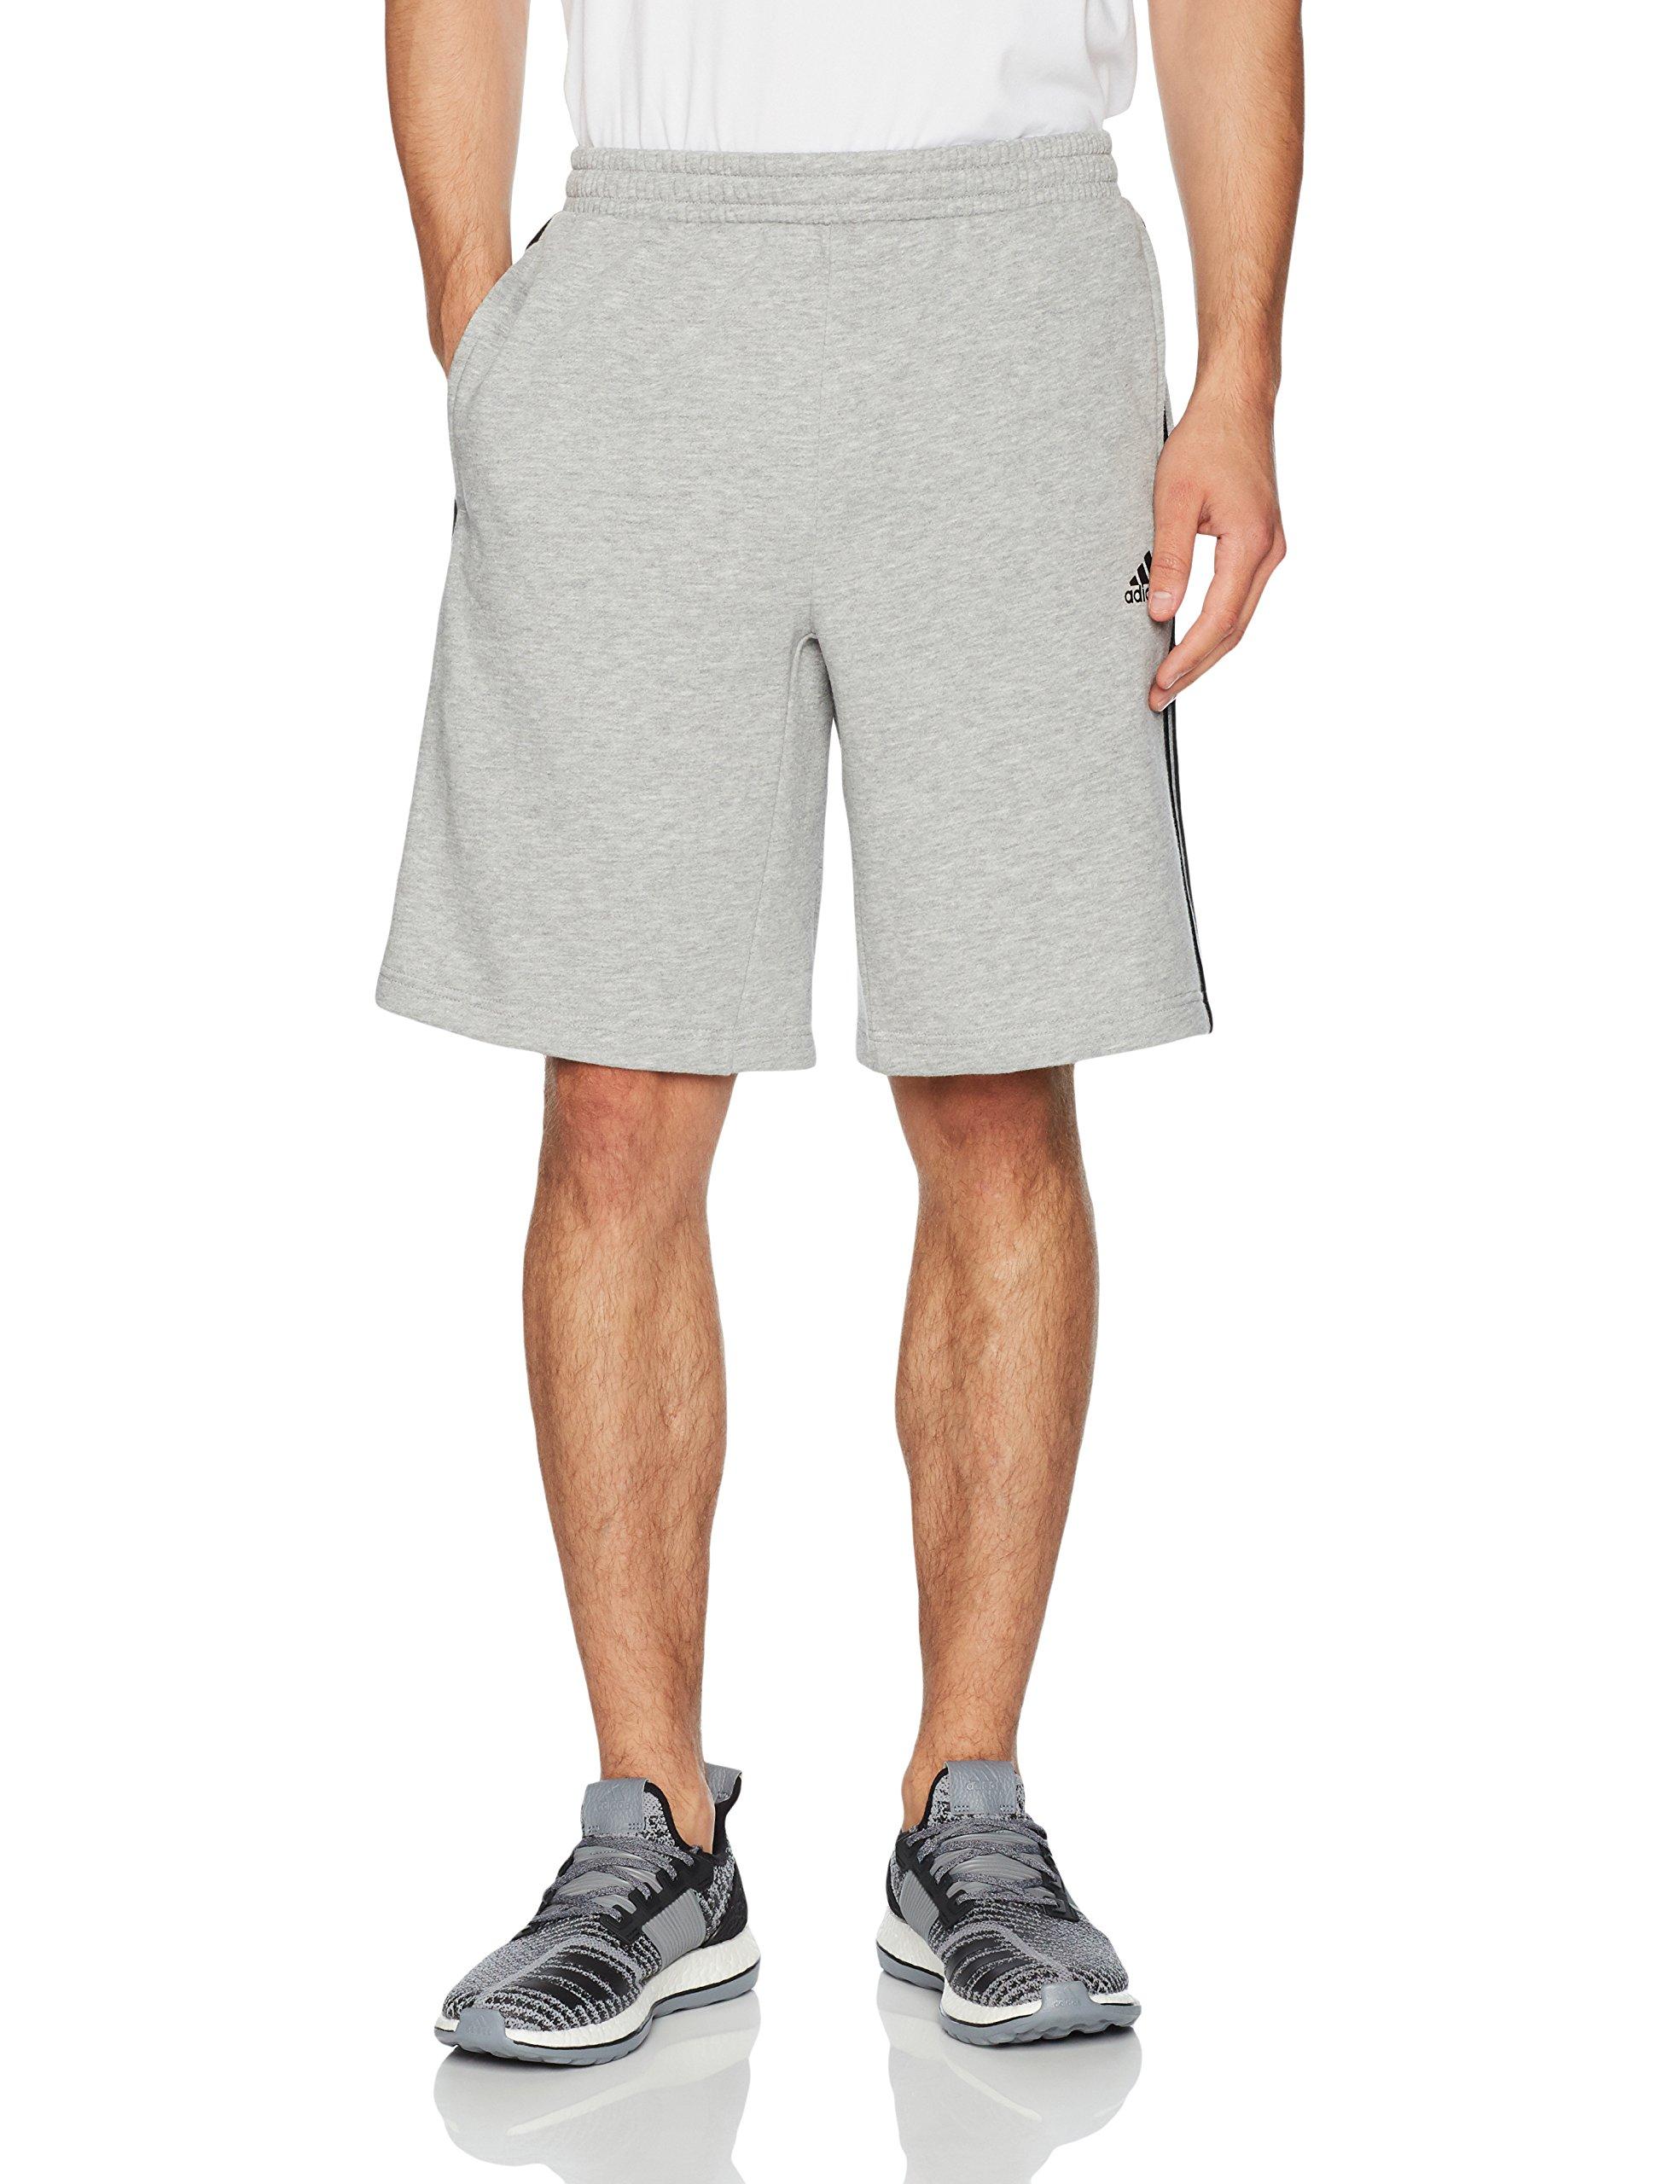 adidas Men's Athletics Essential Cotton Shorts, Medium Grey Heather/Black, Large by adidas